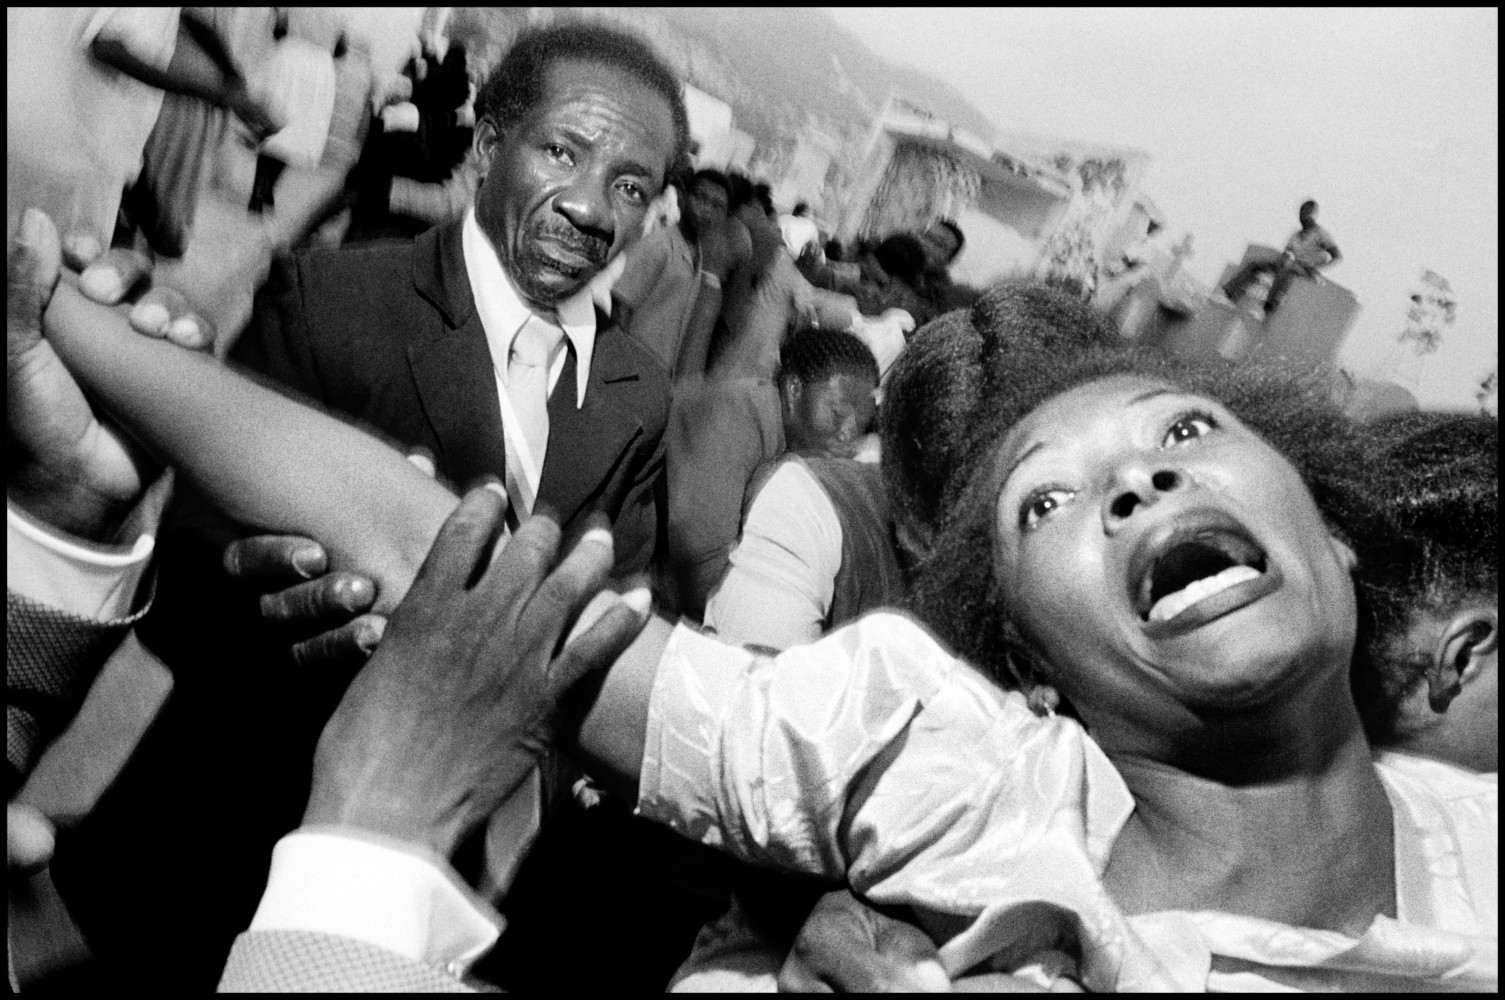 Bruce Gilden (1988, Haiti).